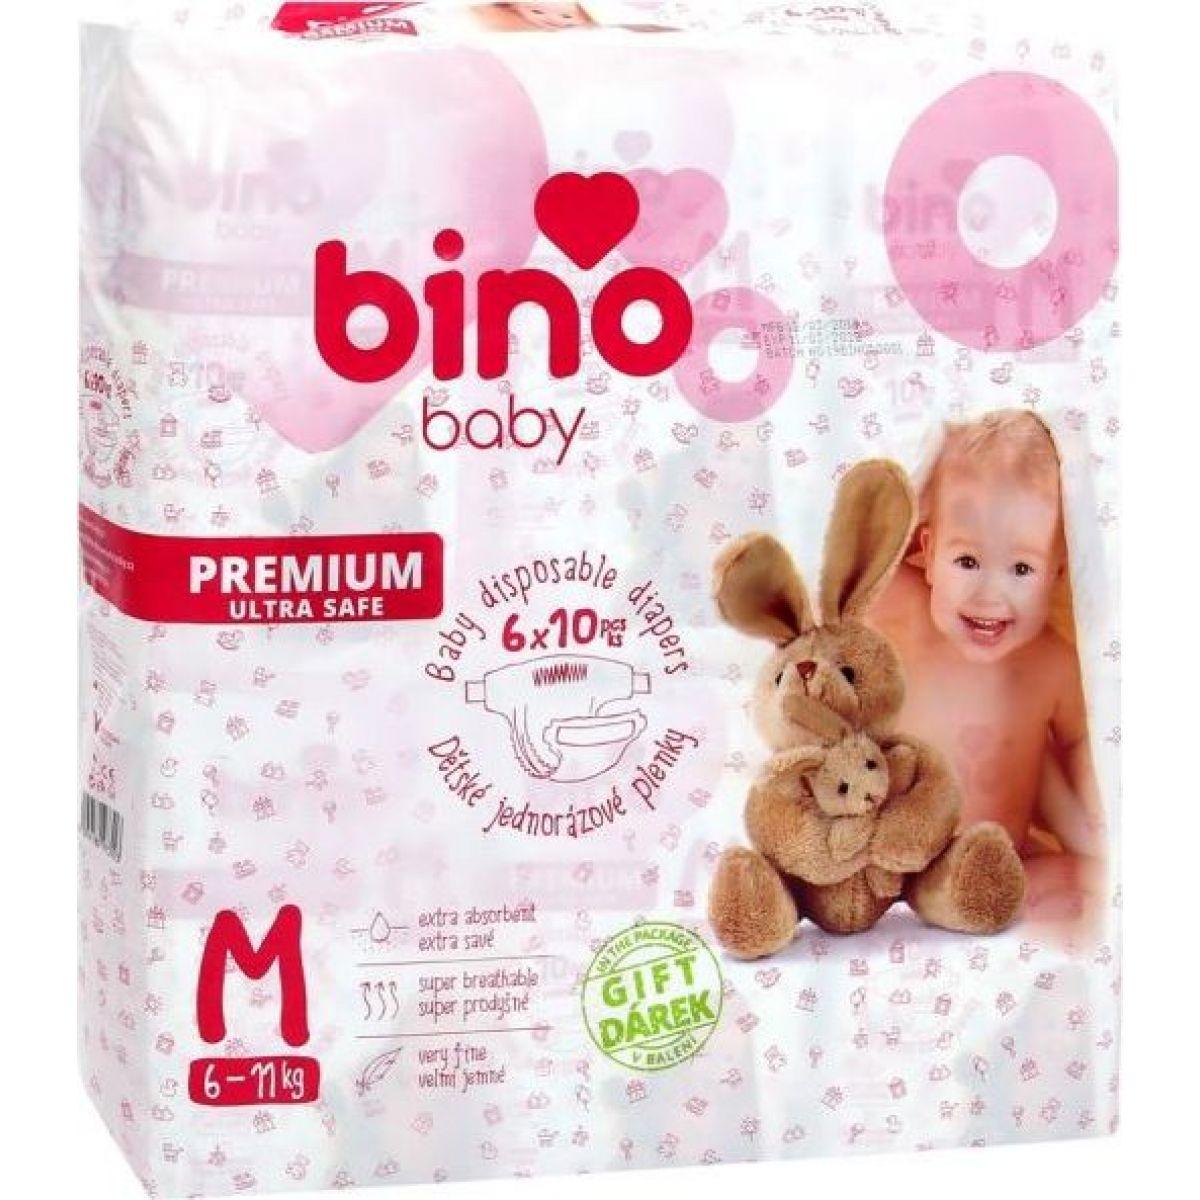 Bino Baby Premium Plienky veľ. M 6-11kg 6x10 ks s darčekom